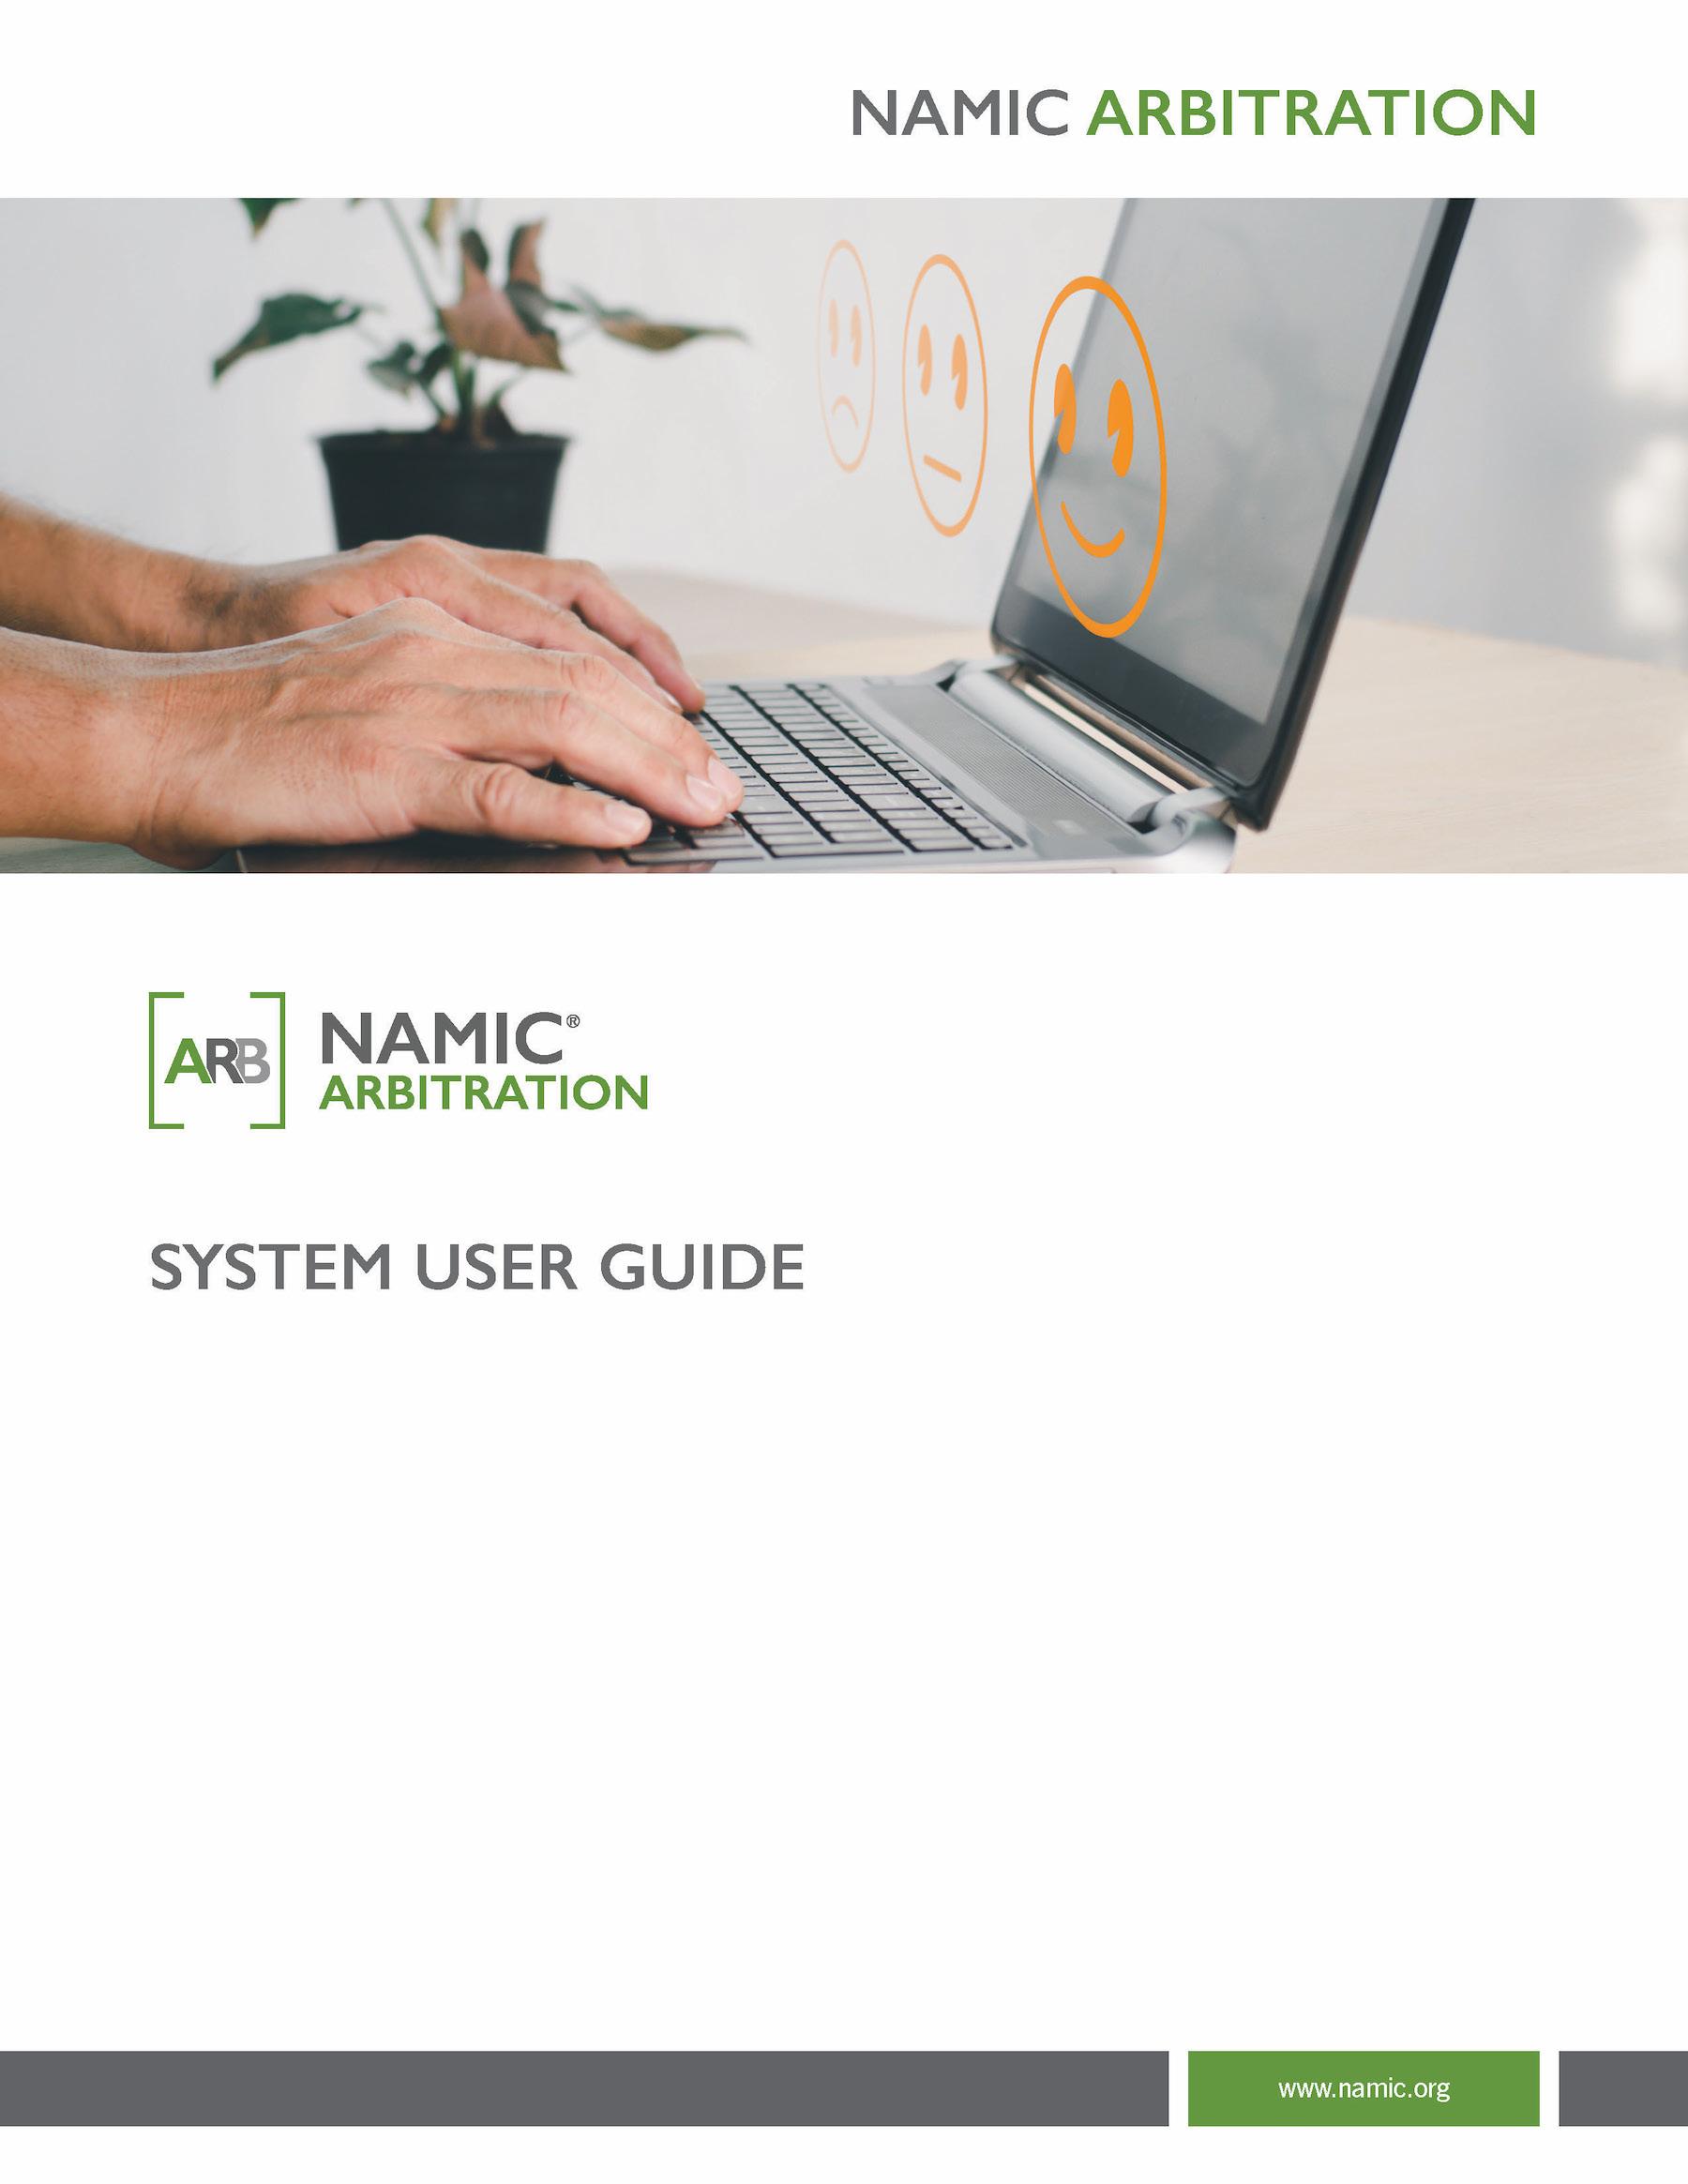 Arbitration System User Guide PDF